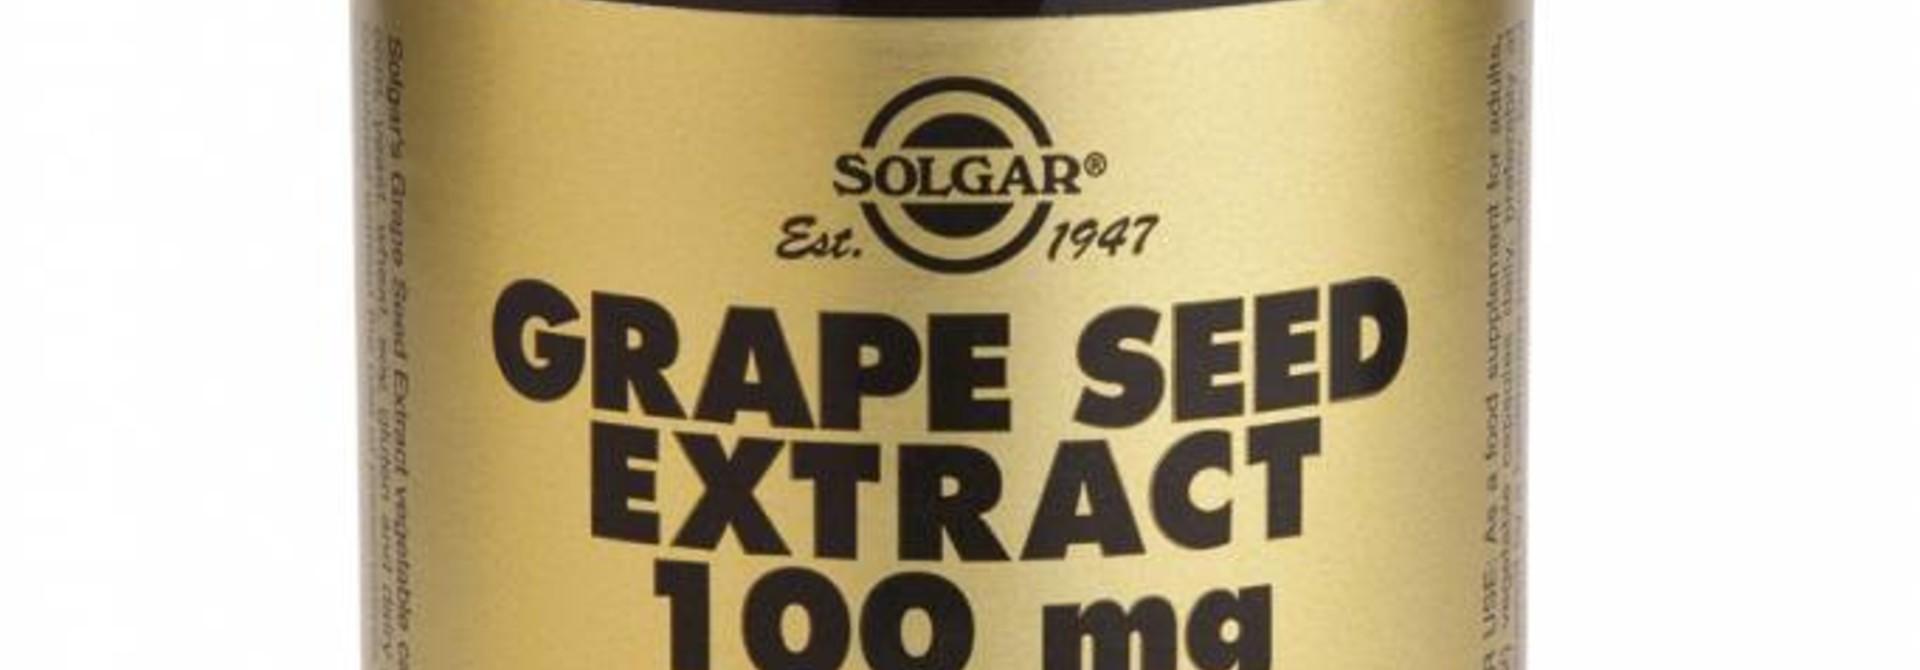 Grape Seed Extract 100 mg 30 plantaardige capsules